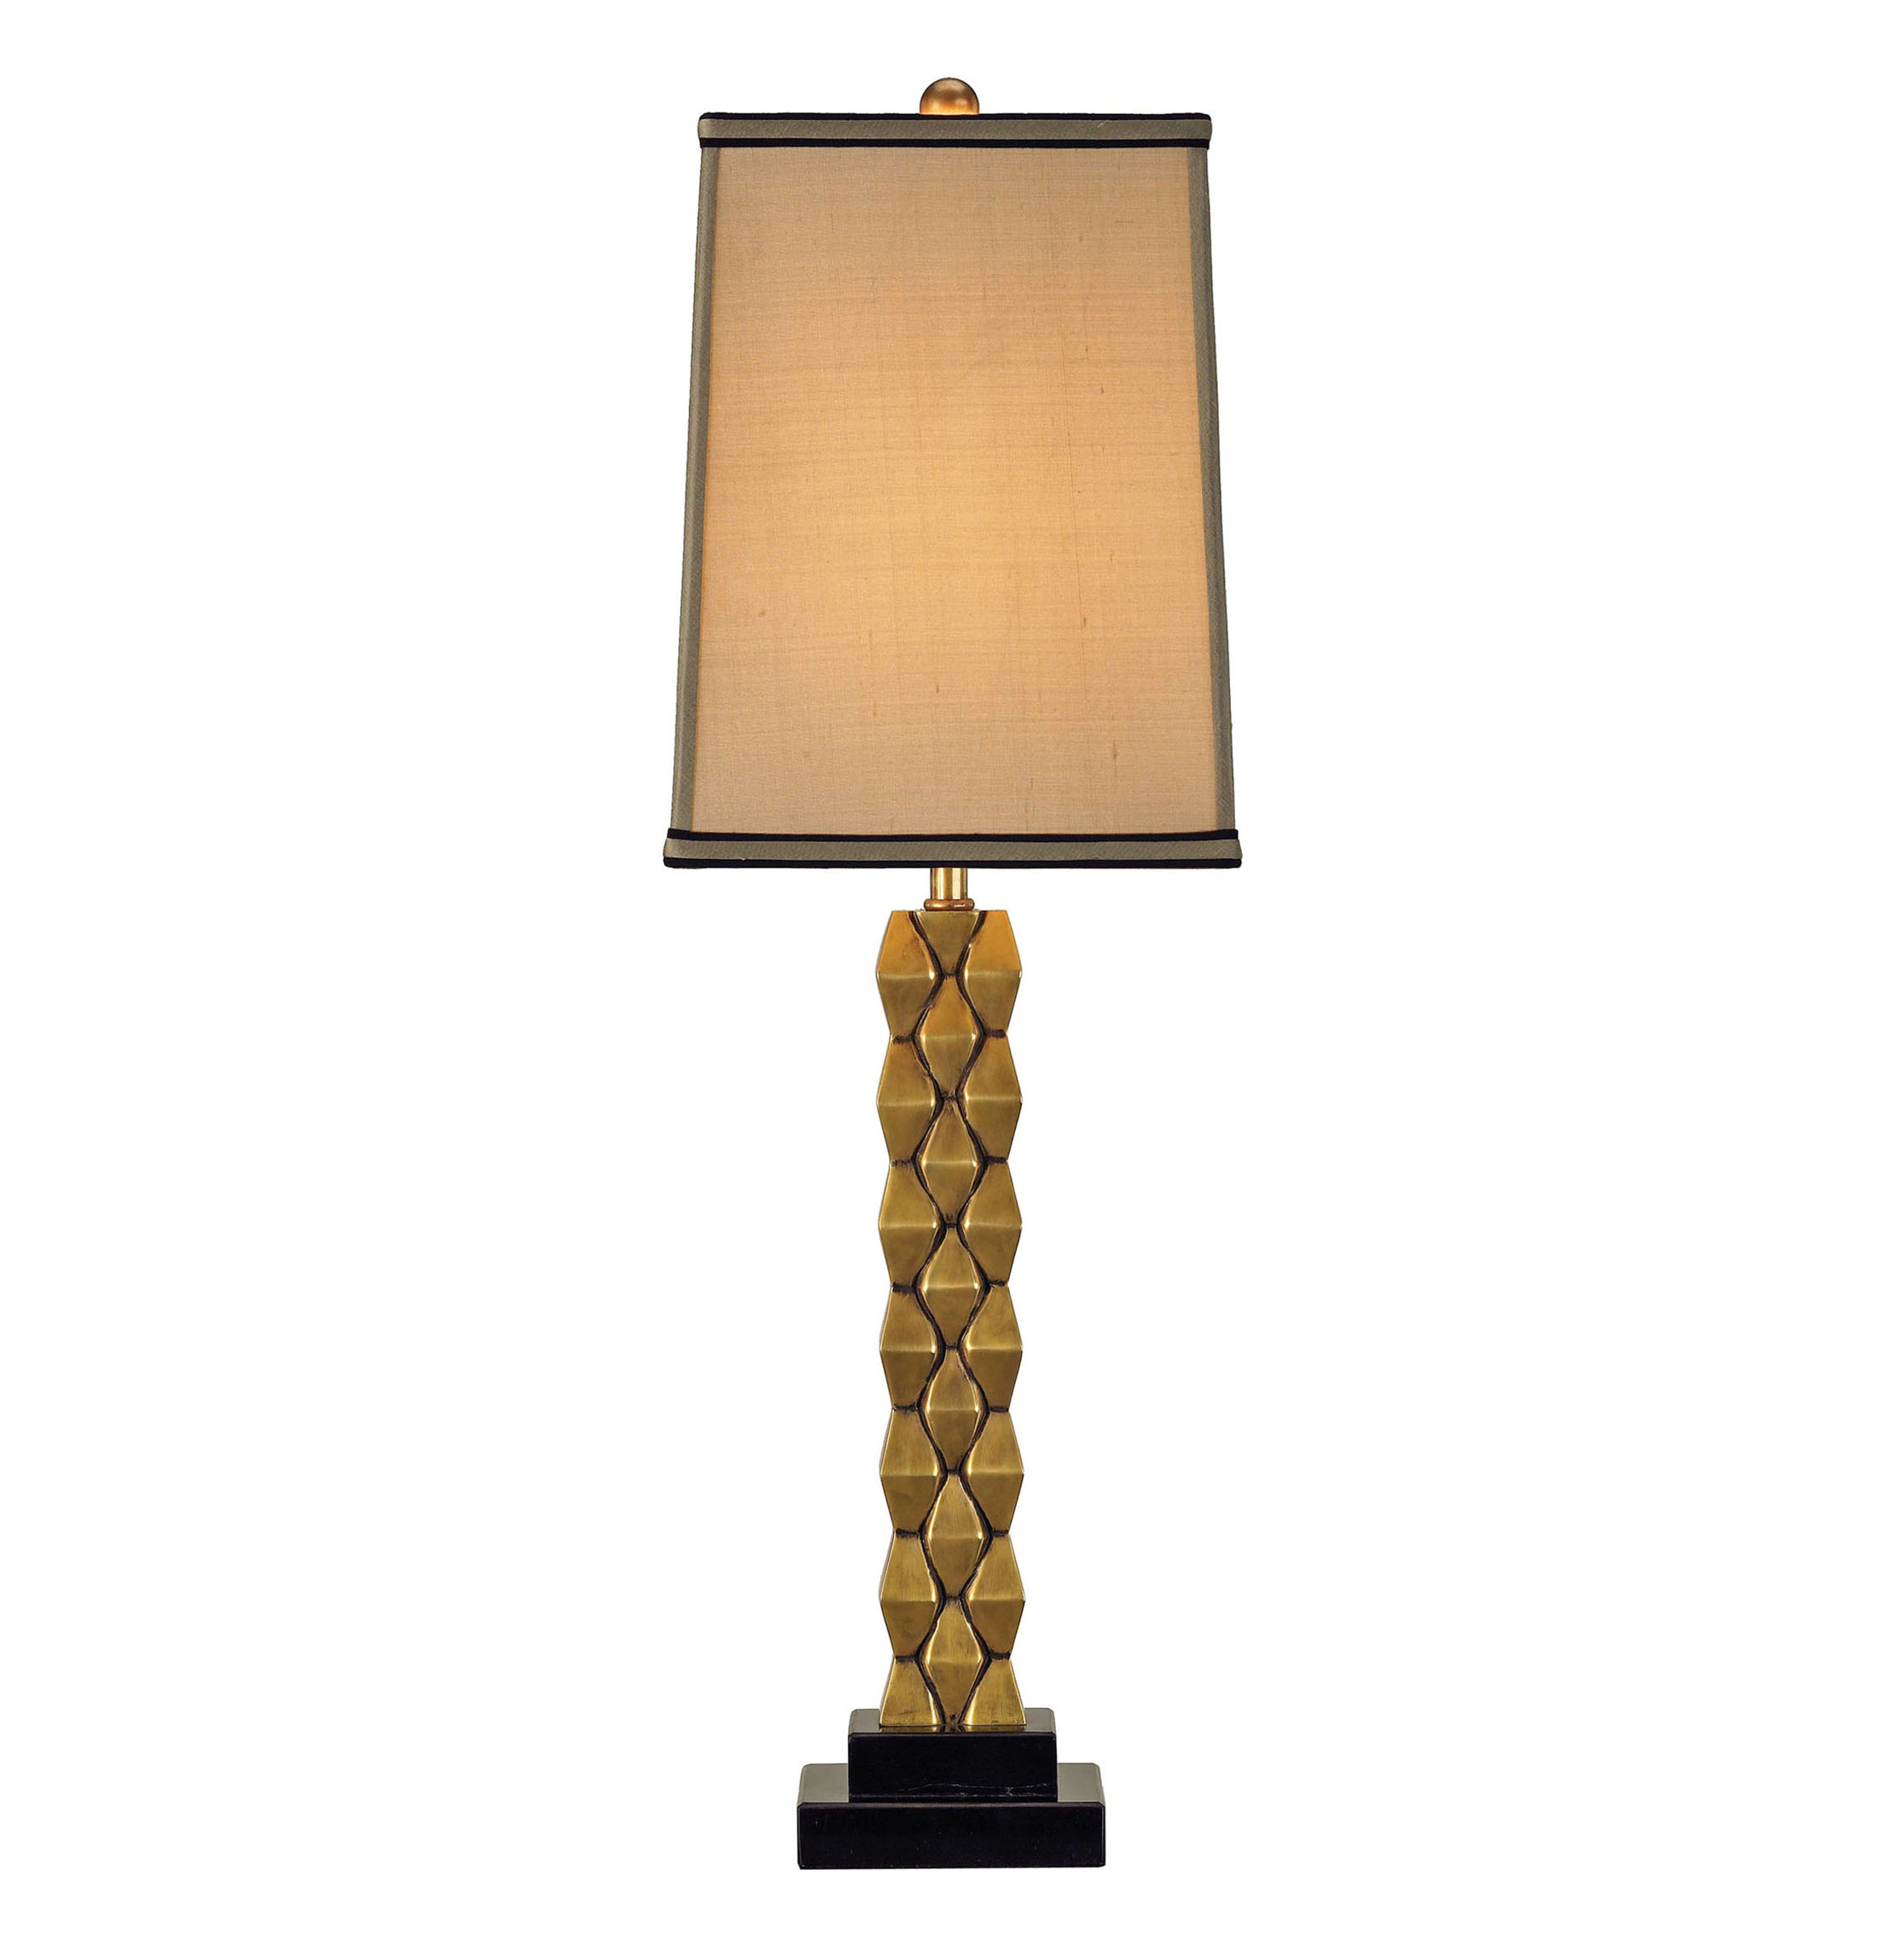 Debonair Tall Cast Brass Column Masculine Table Lamp - 30 Inch